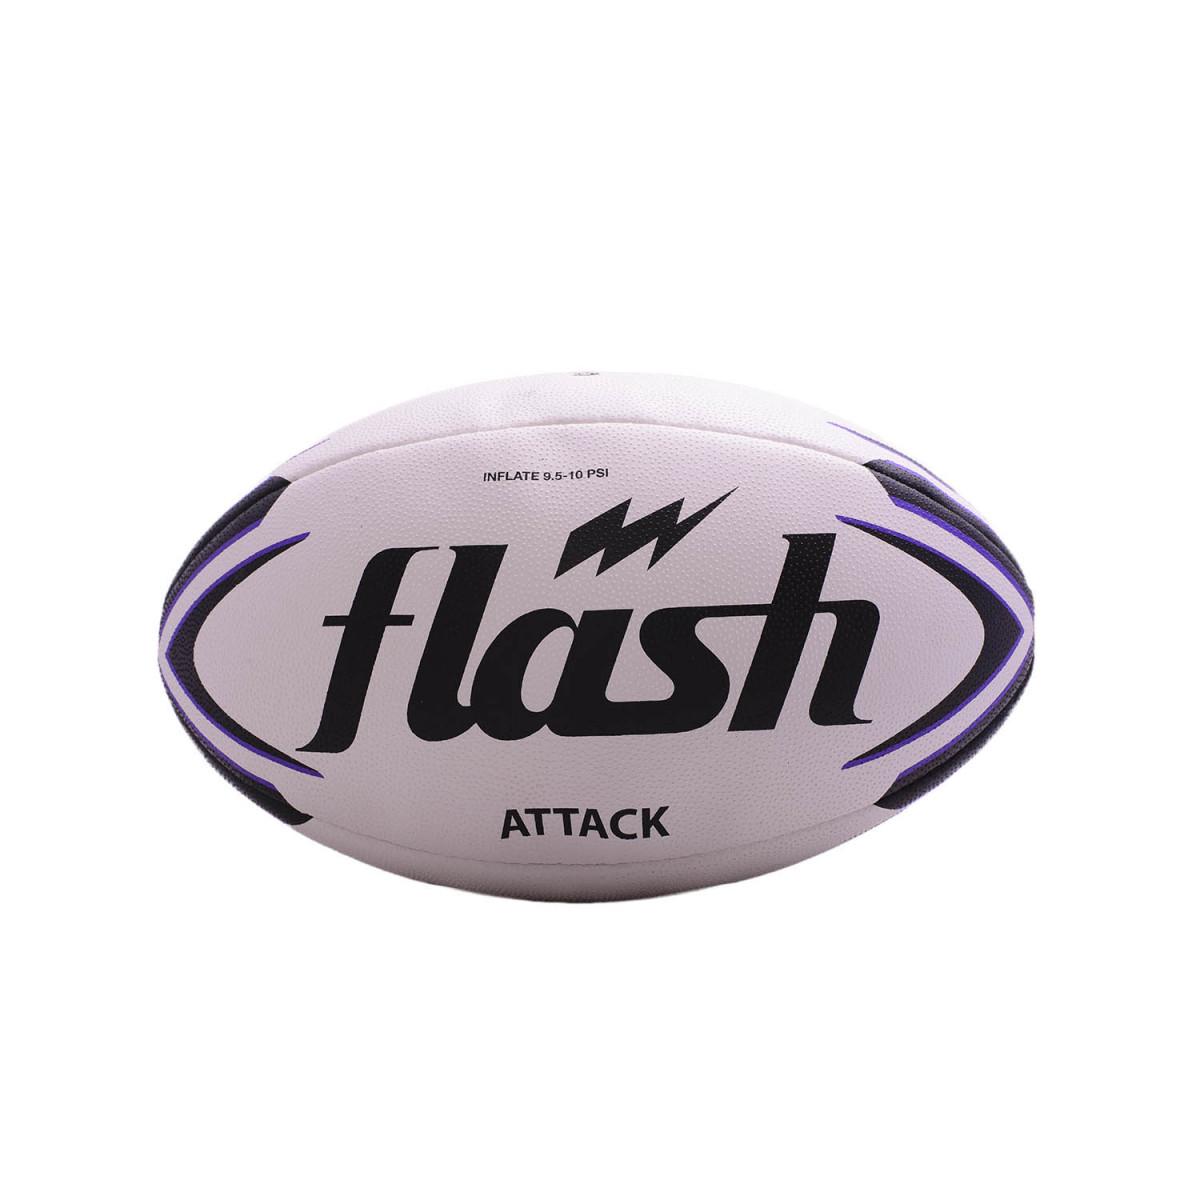 Pelota Flash Rugby Attack Nº 5 Sporting - Pelotas - Accesorios - Hombre 59bad4e0d18a6